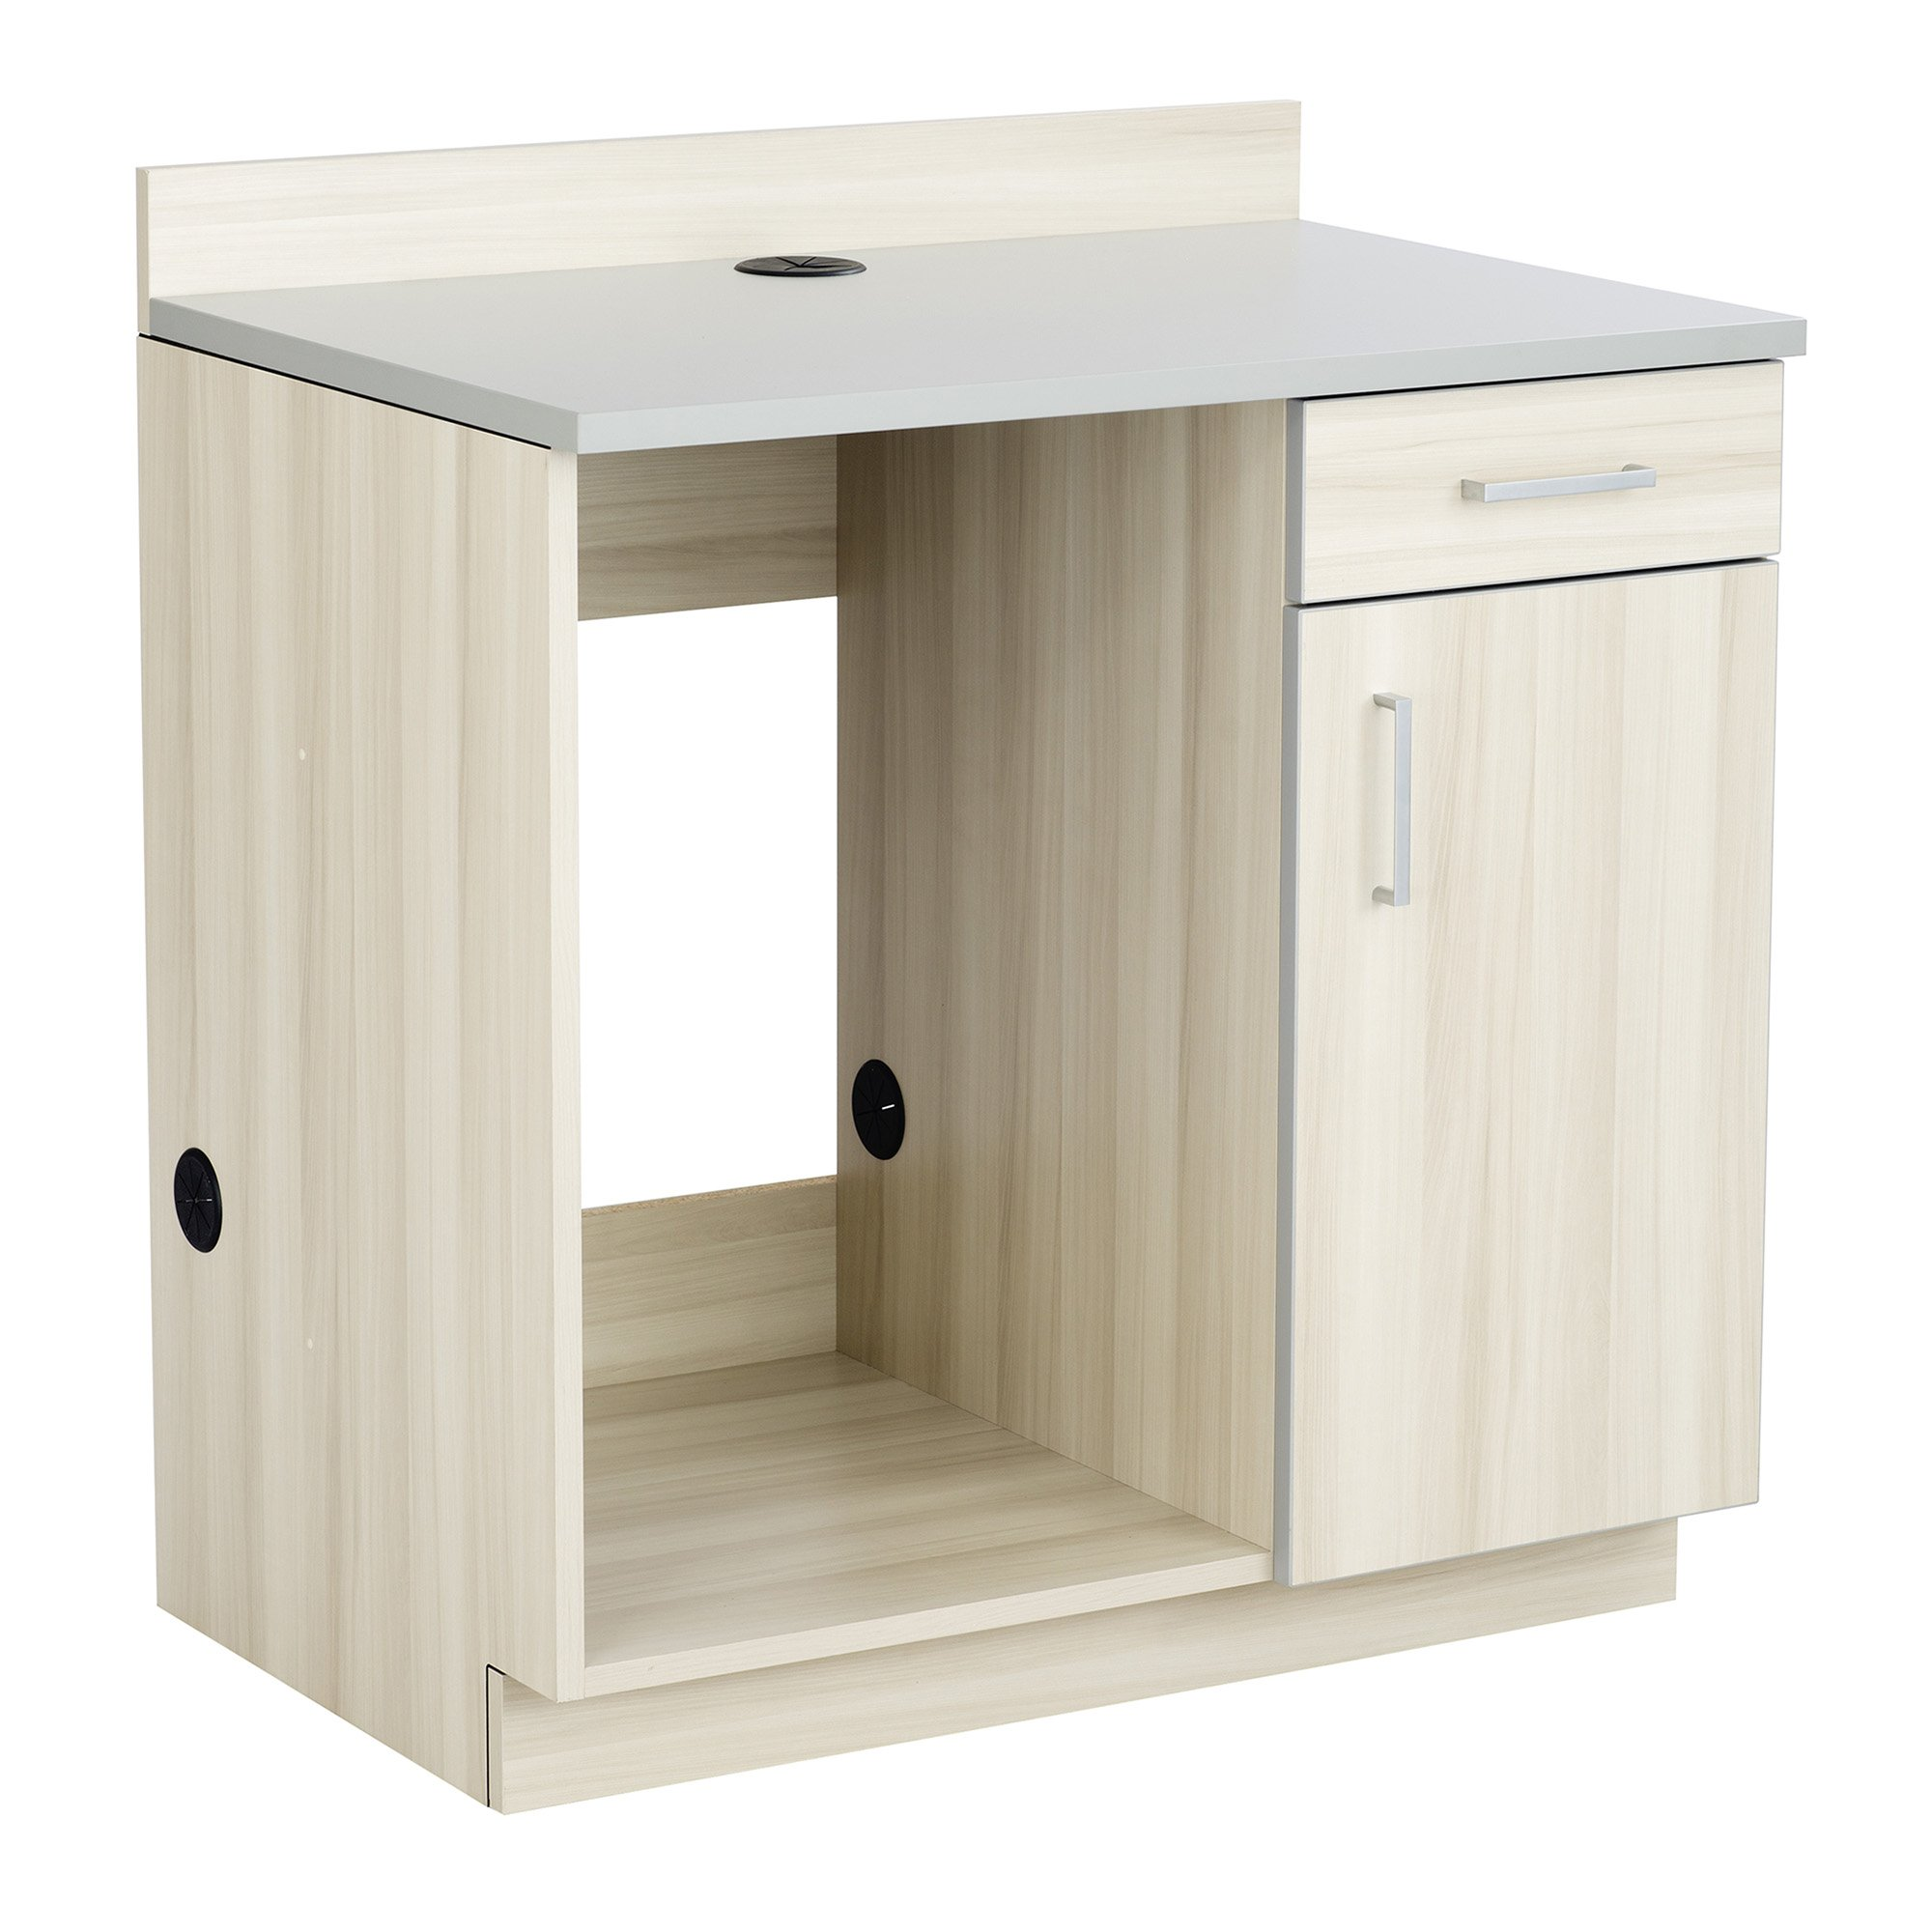 Safco Products 1705VS Modular Hospitality Breakroom Base Cabinet, Appliance, Vanilla Stix Base/Gray Top